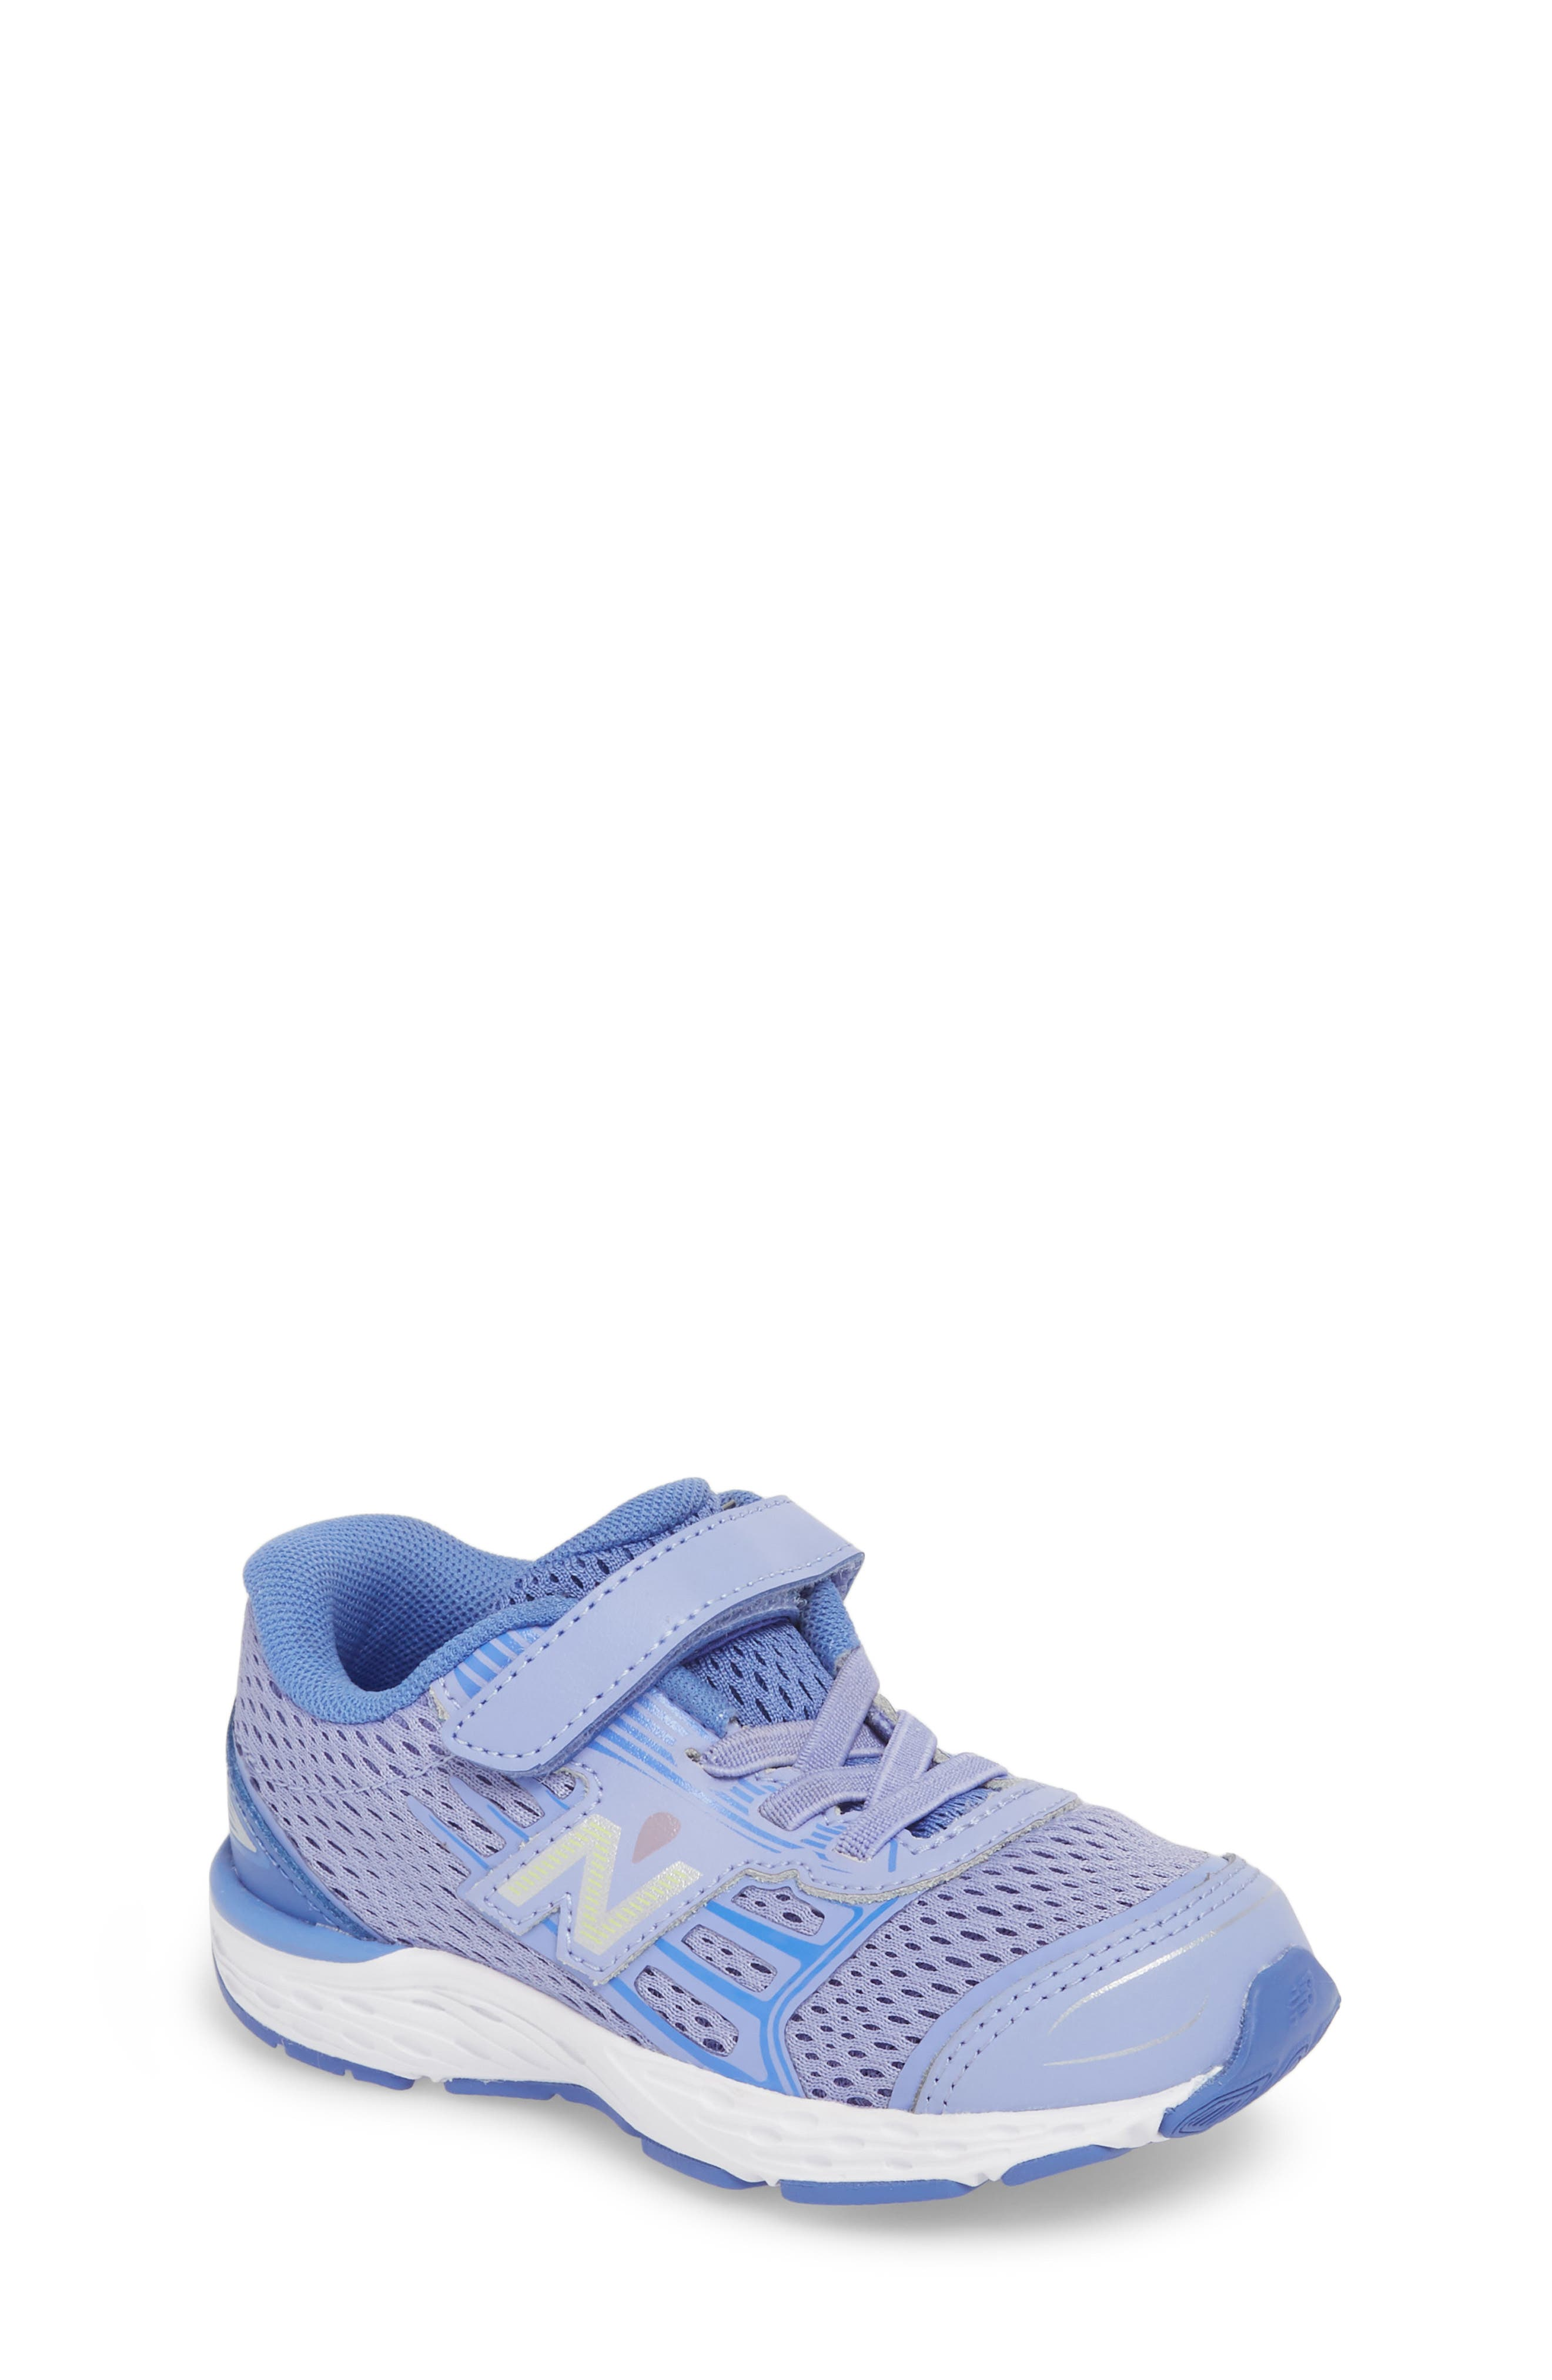 680v5 Sneaker,                             Main thumbnail 1, color,                             ICE VIOLET